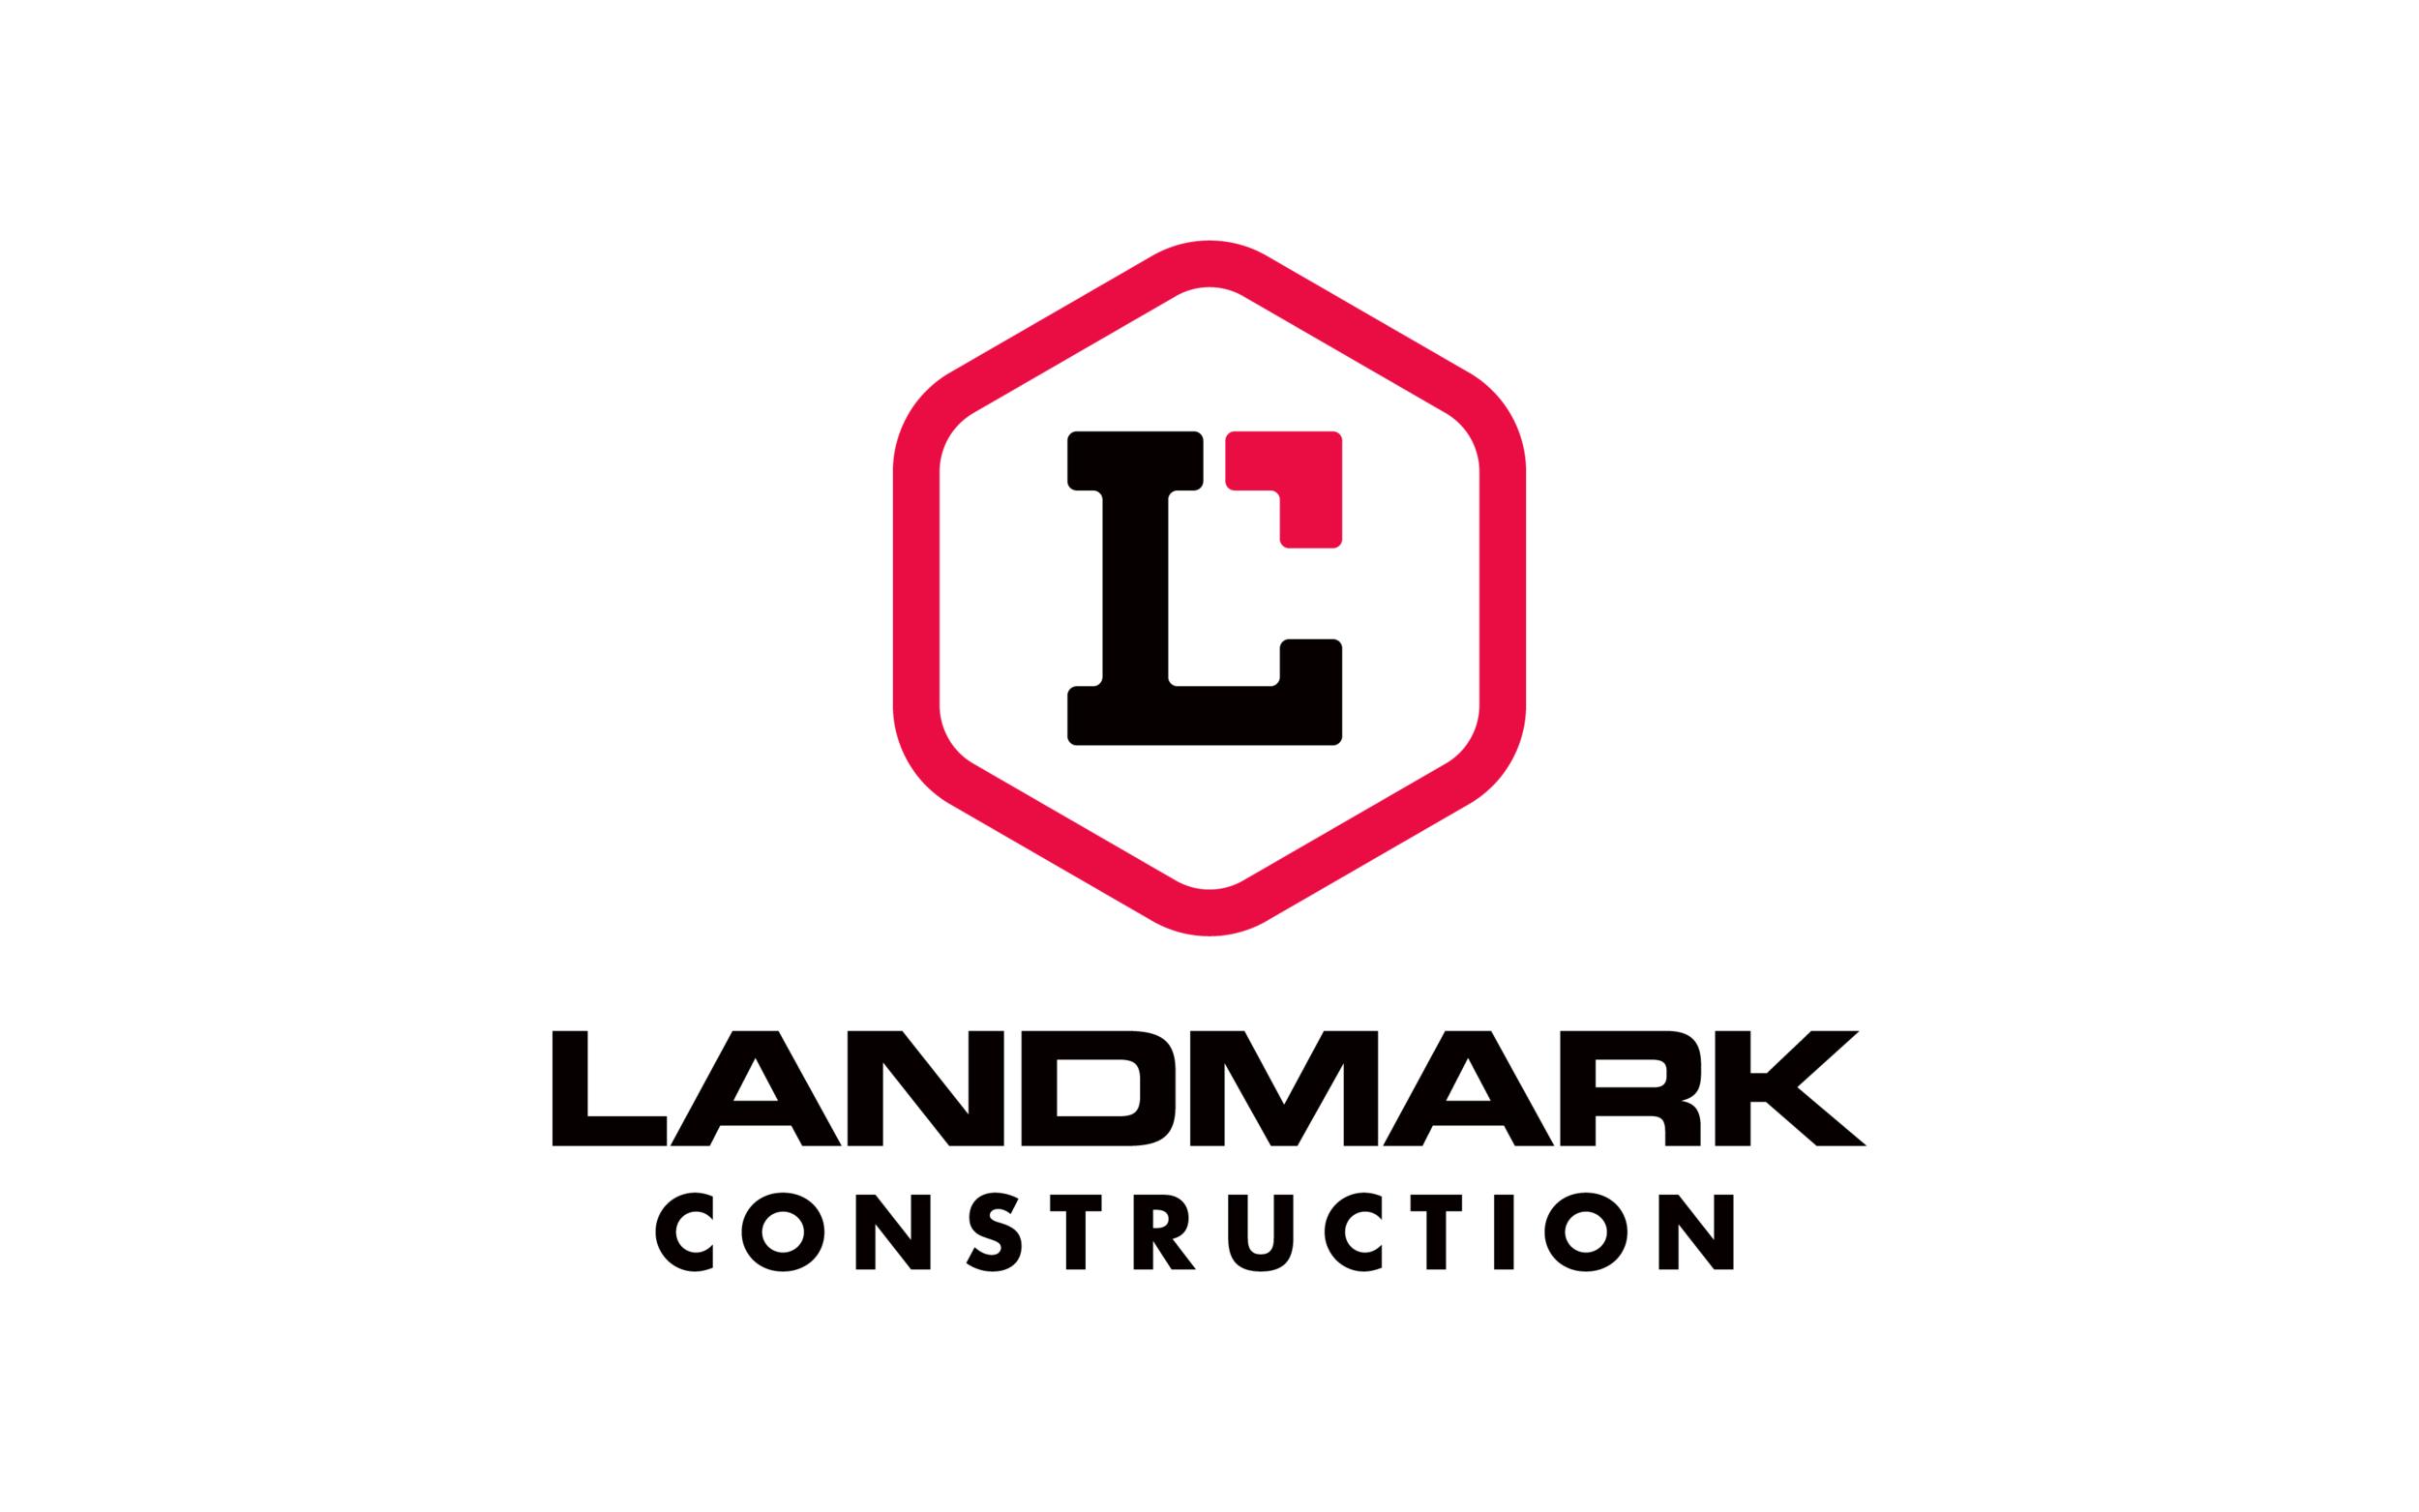 landmark_001.png